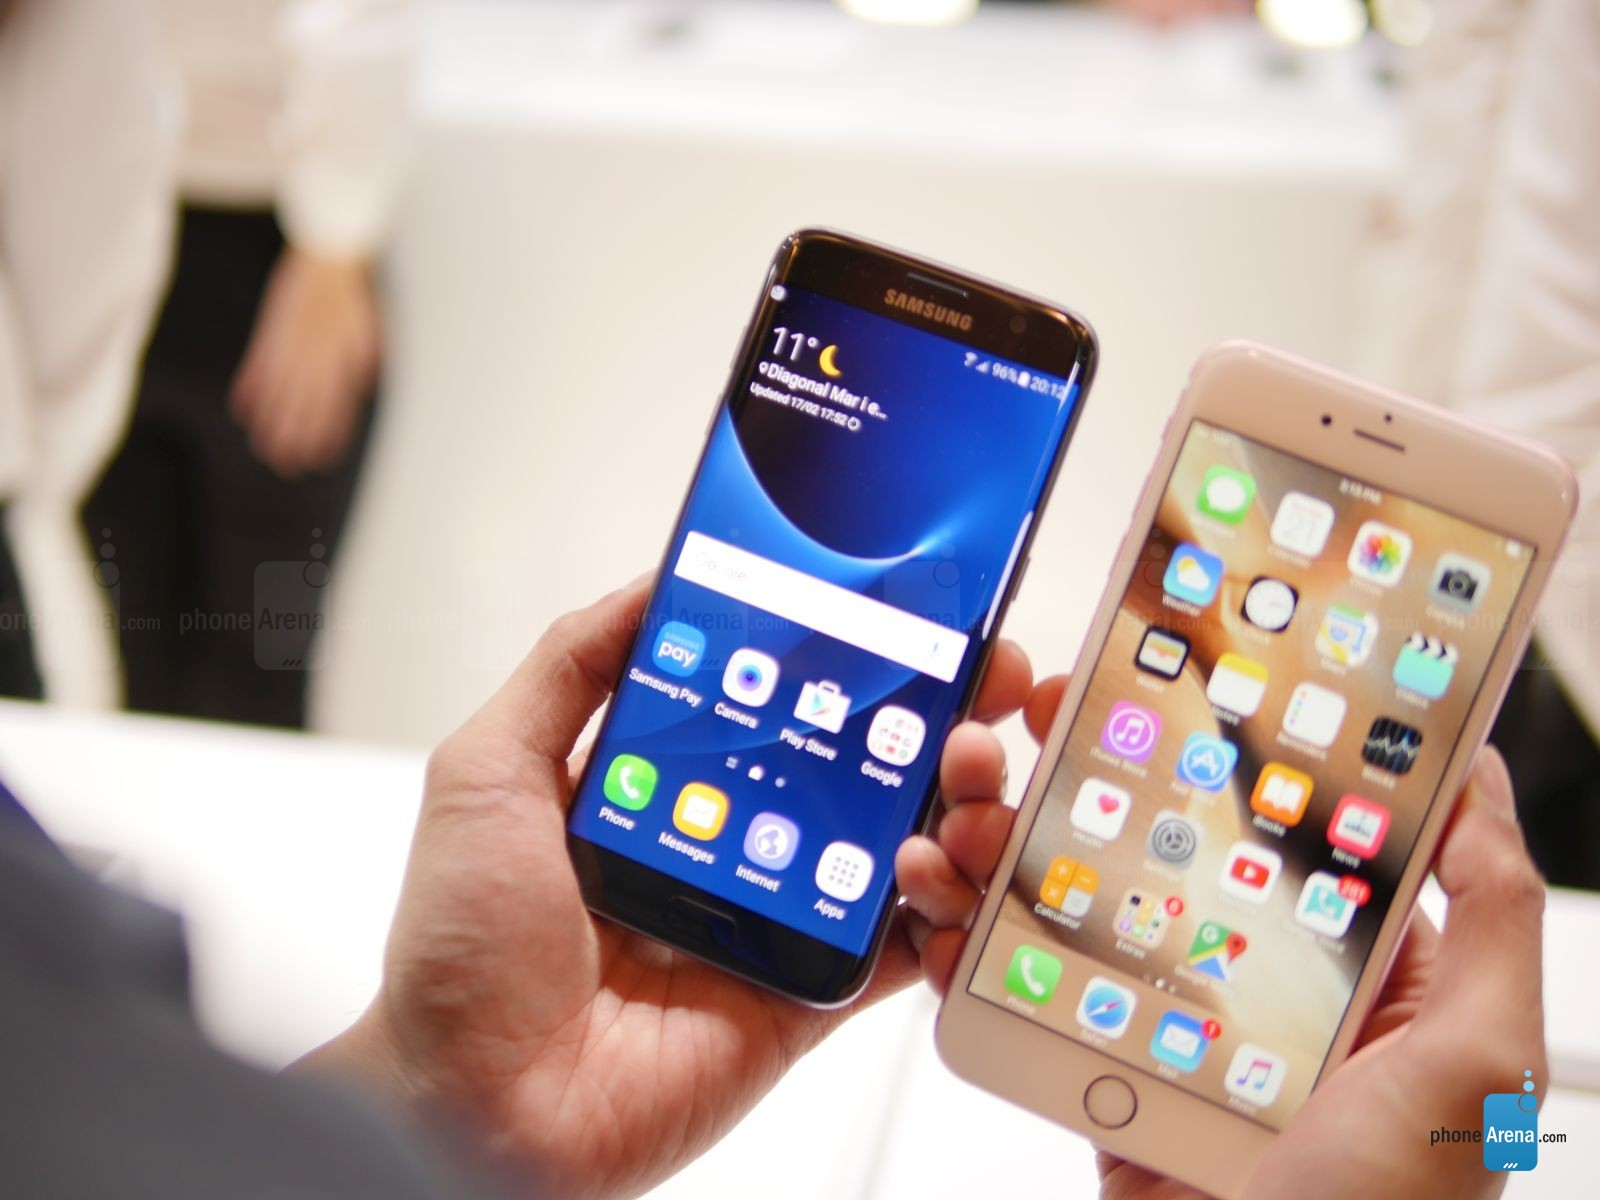 Samsung-Galaxy-S7-edge-vs-Apple-iPhone-6s-Plus